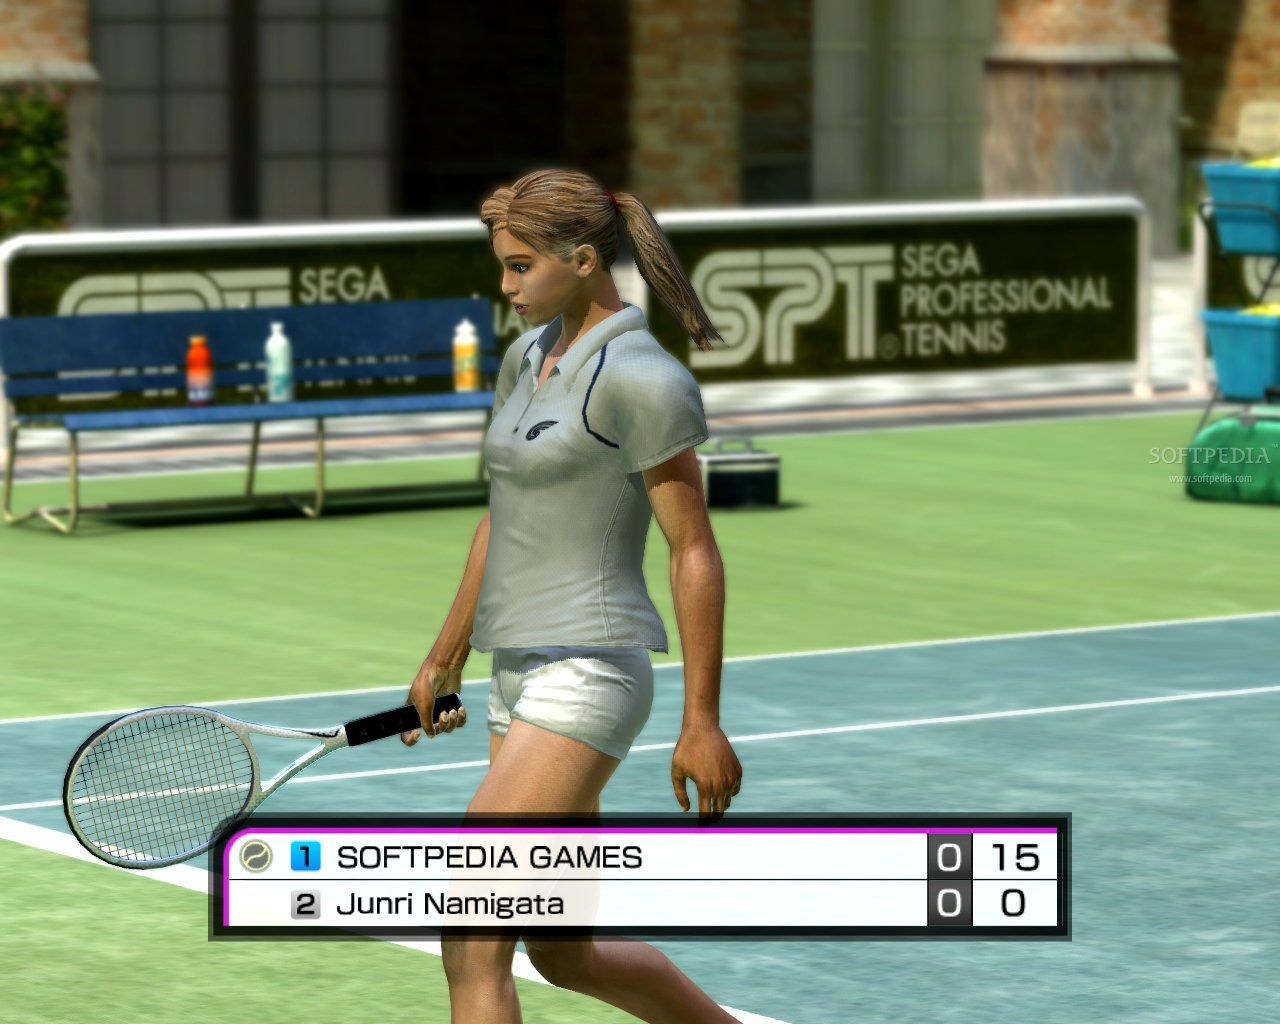 Virtua tennis 4 sega pc